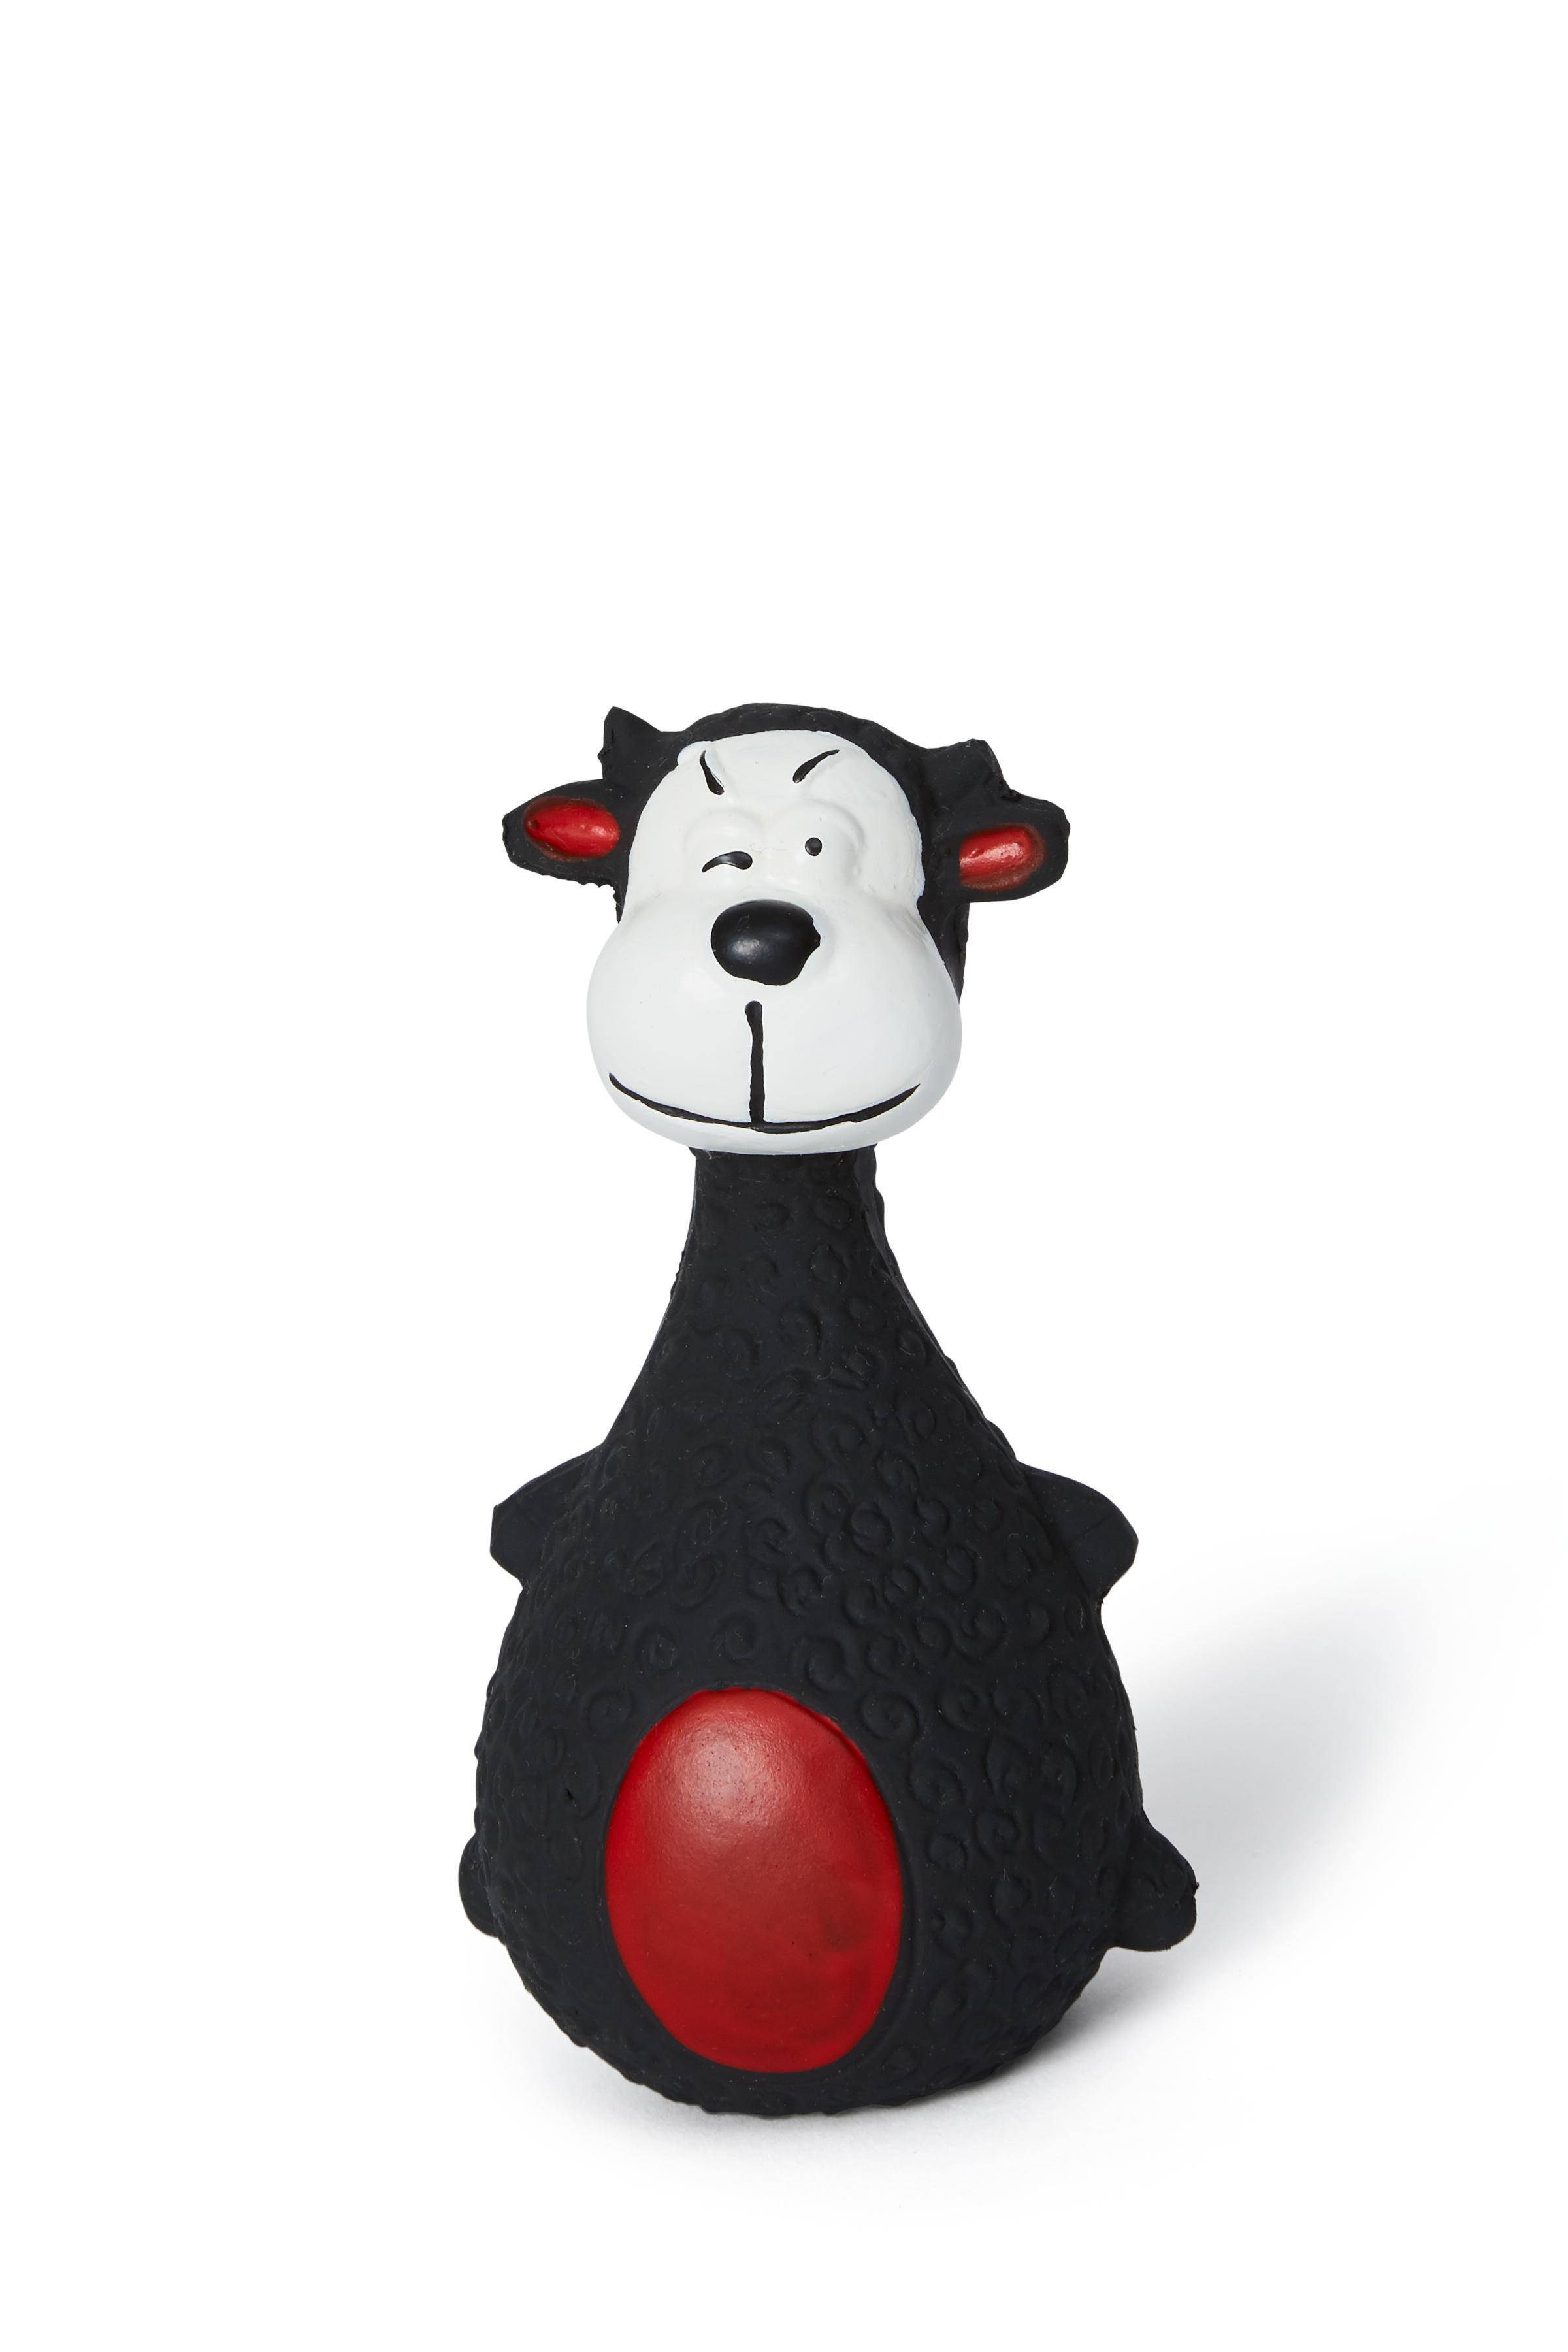 Bud'z Latex Sheep Squeaker Dog Toy, 13-cm